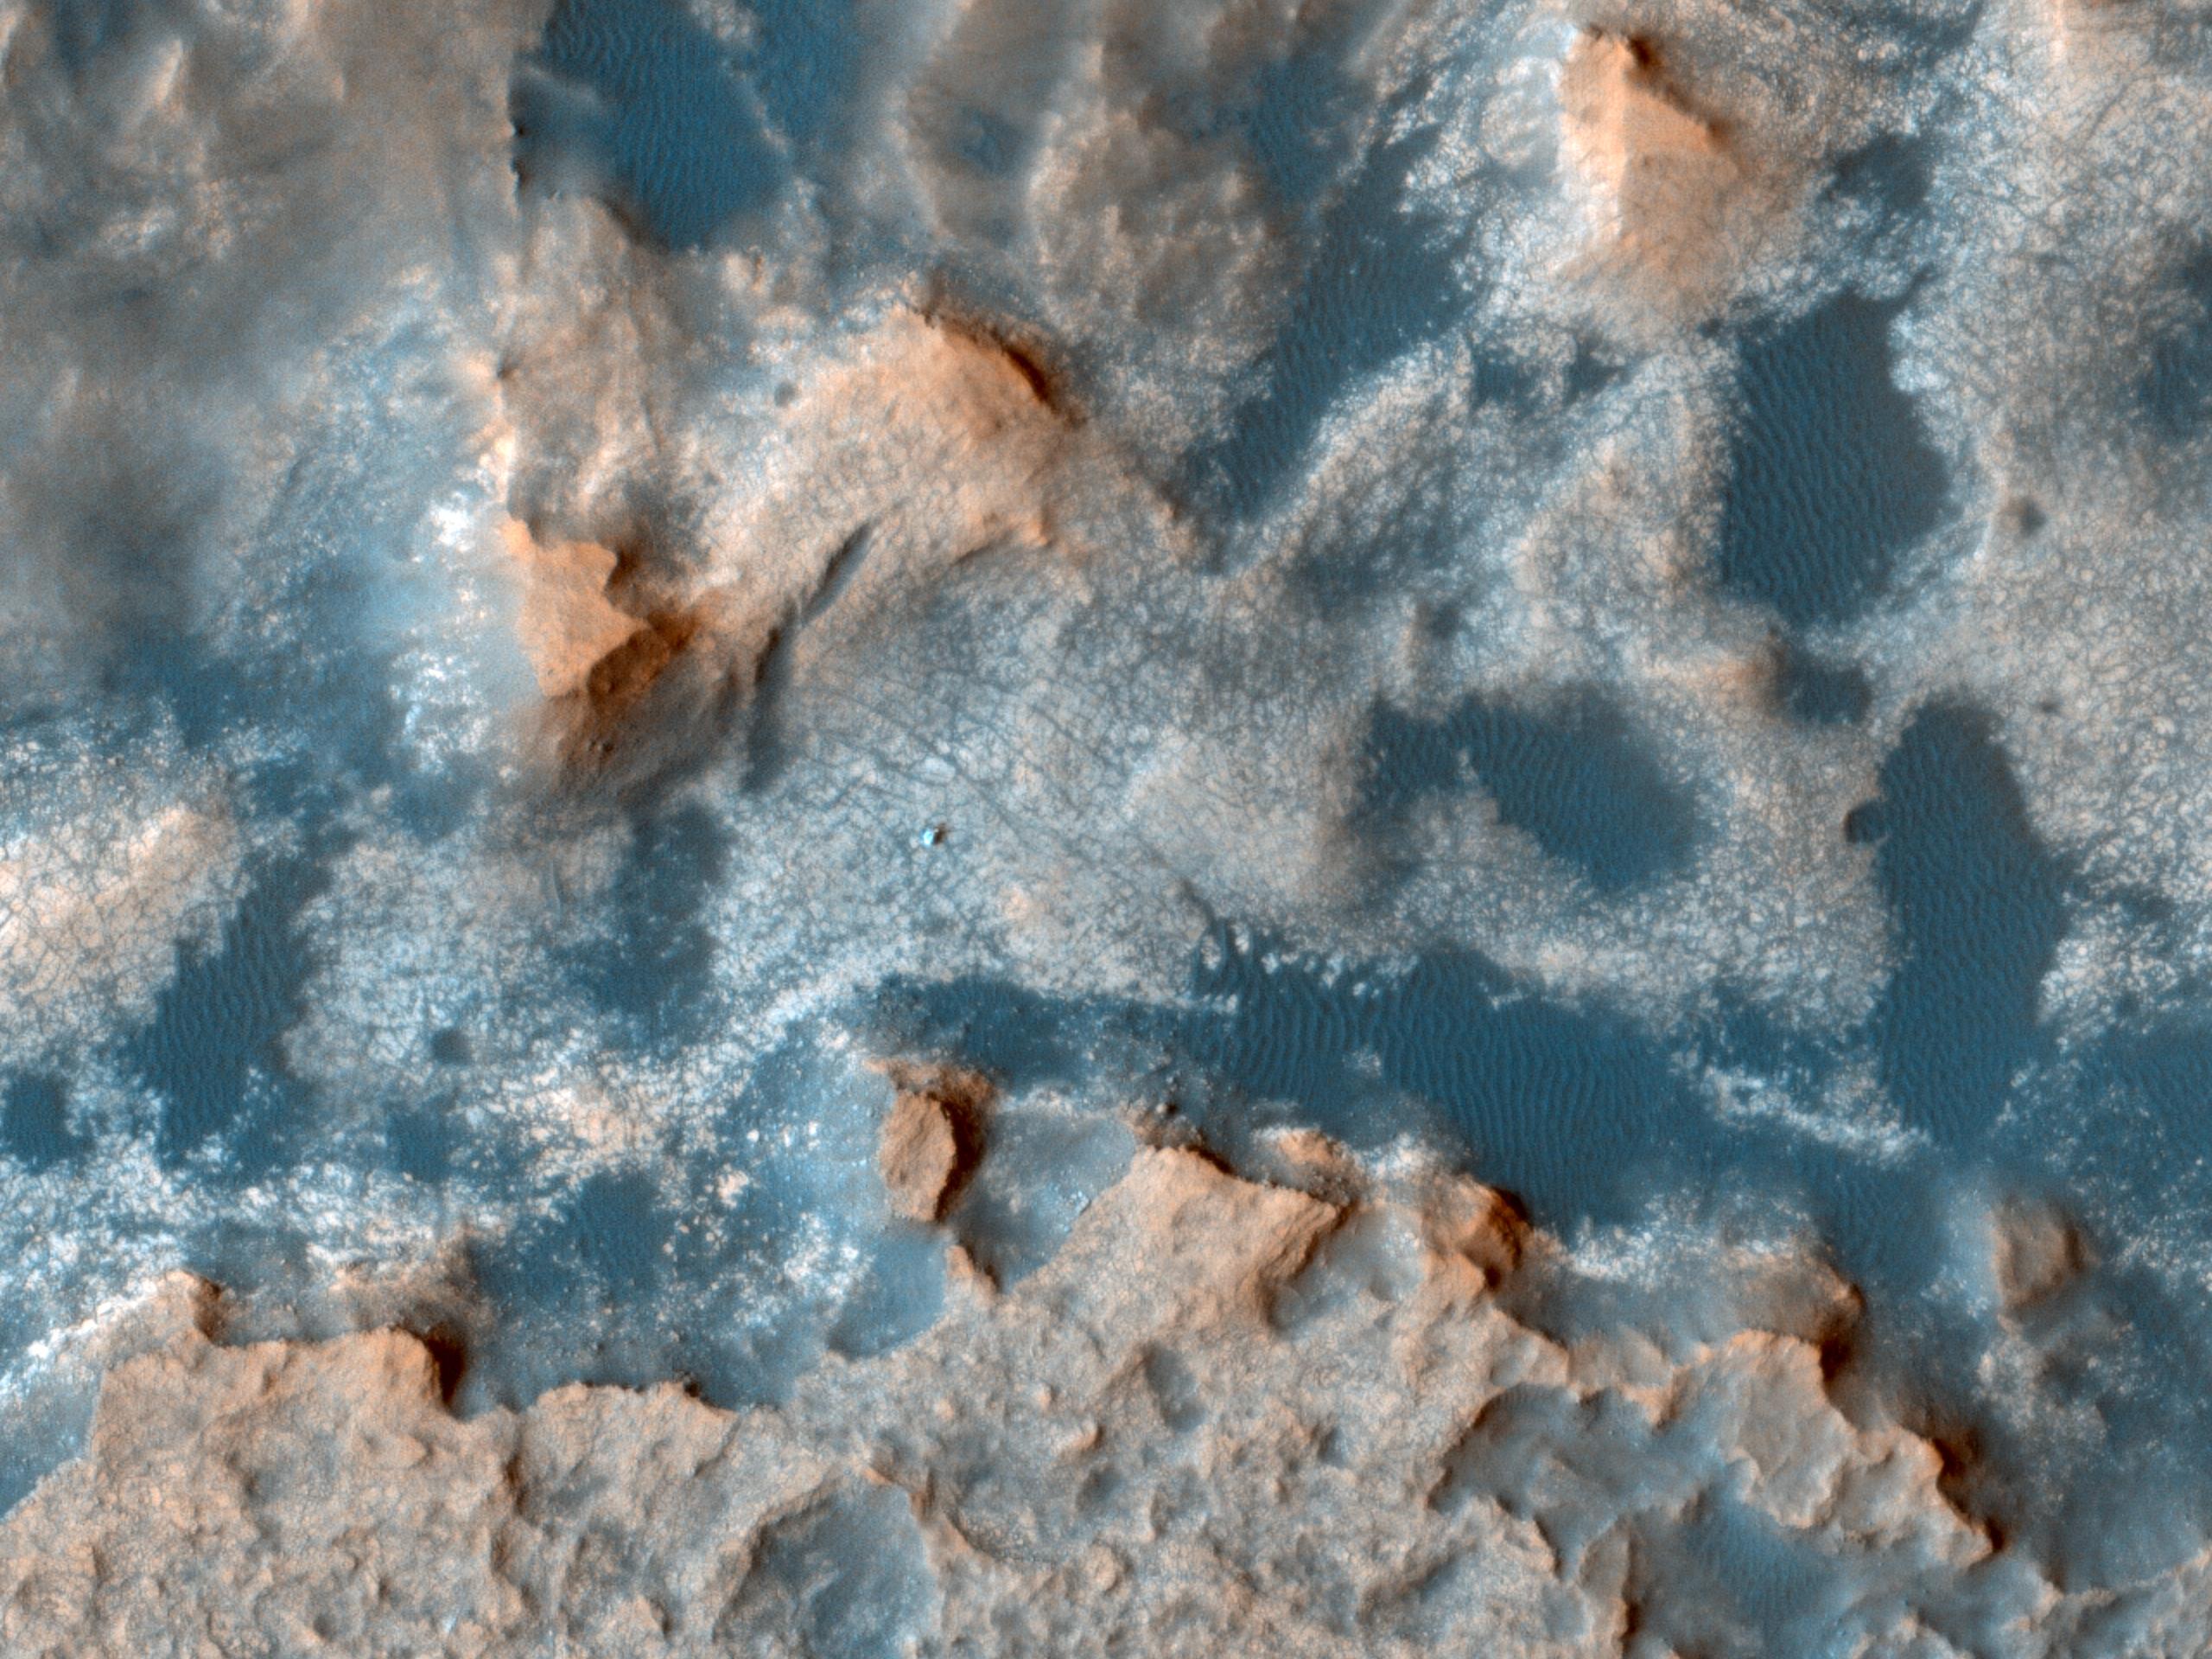 Monitoring near the Curiosity Rover